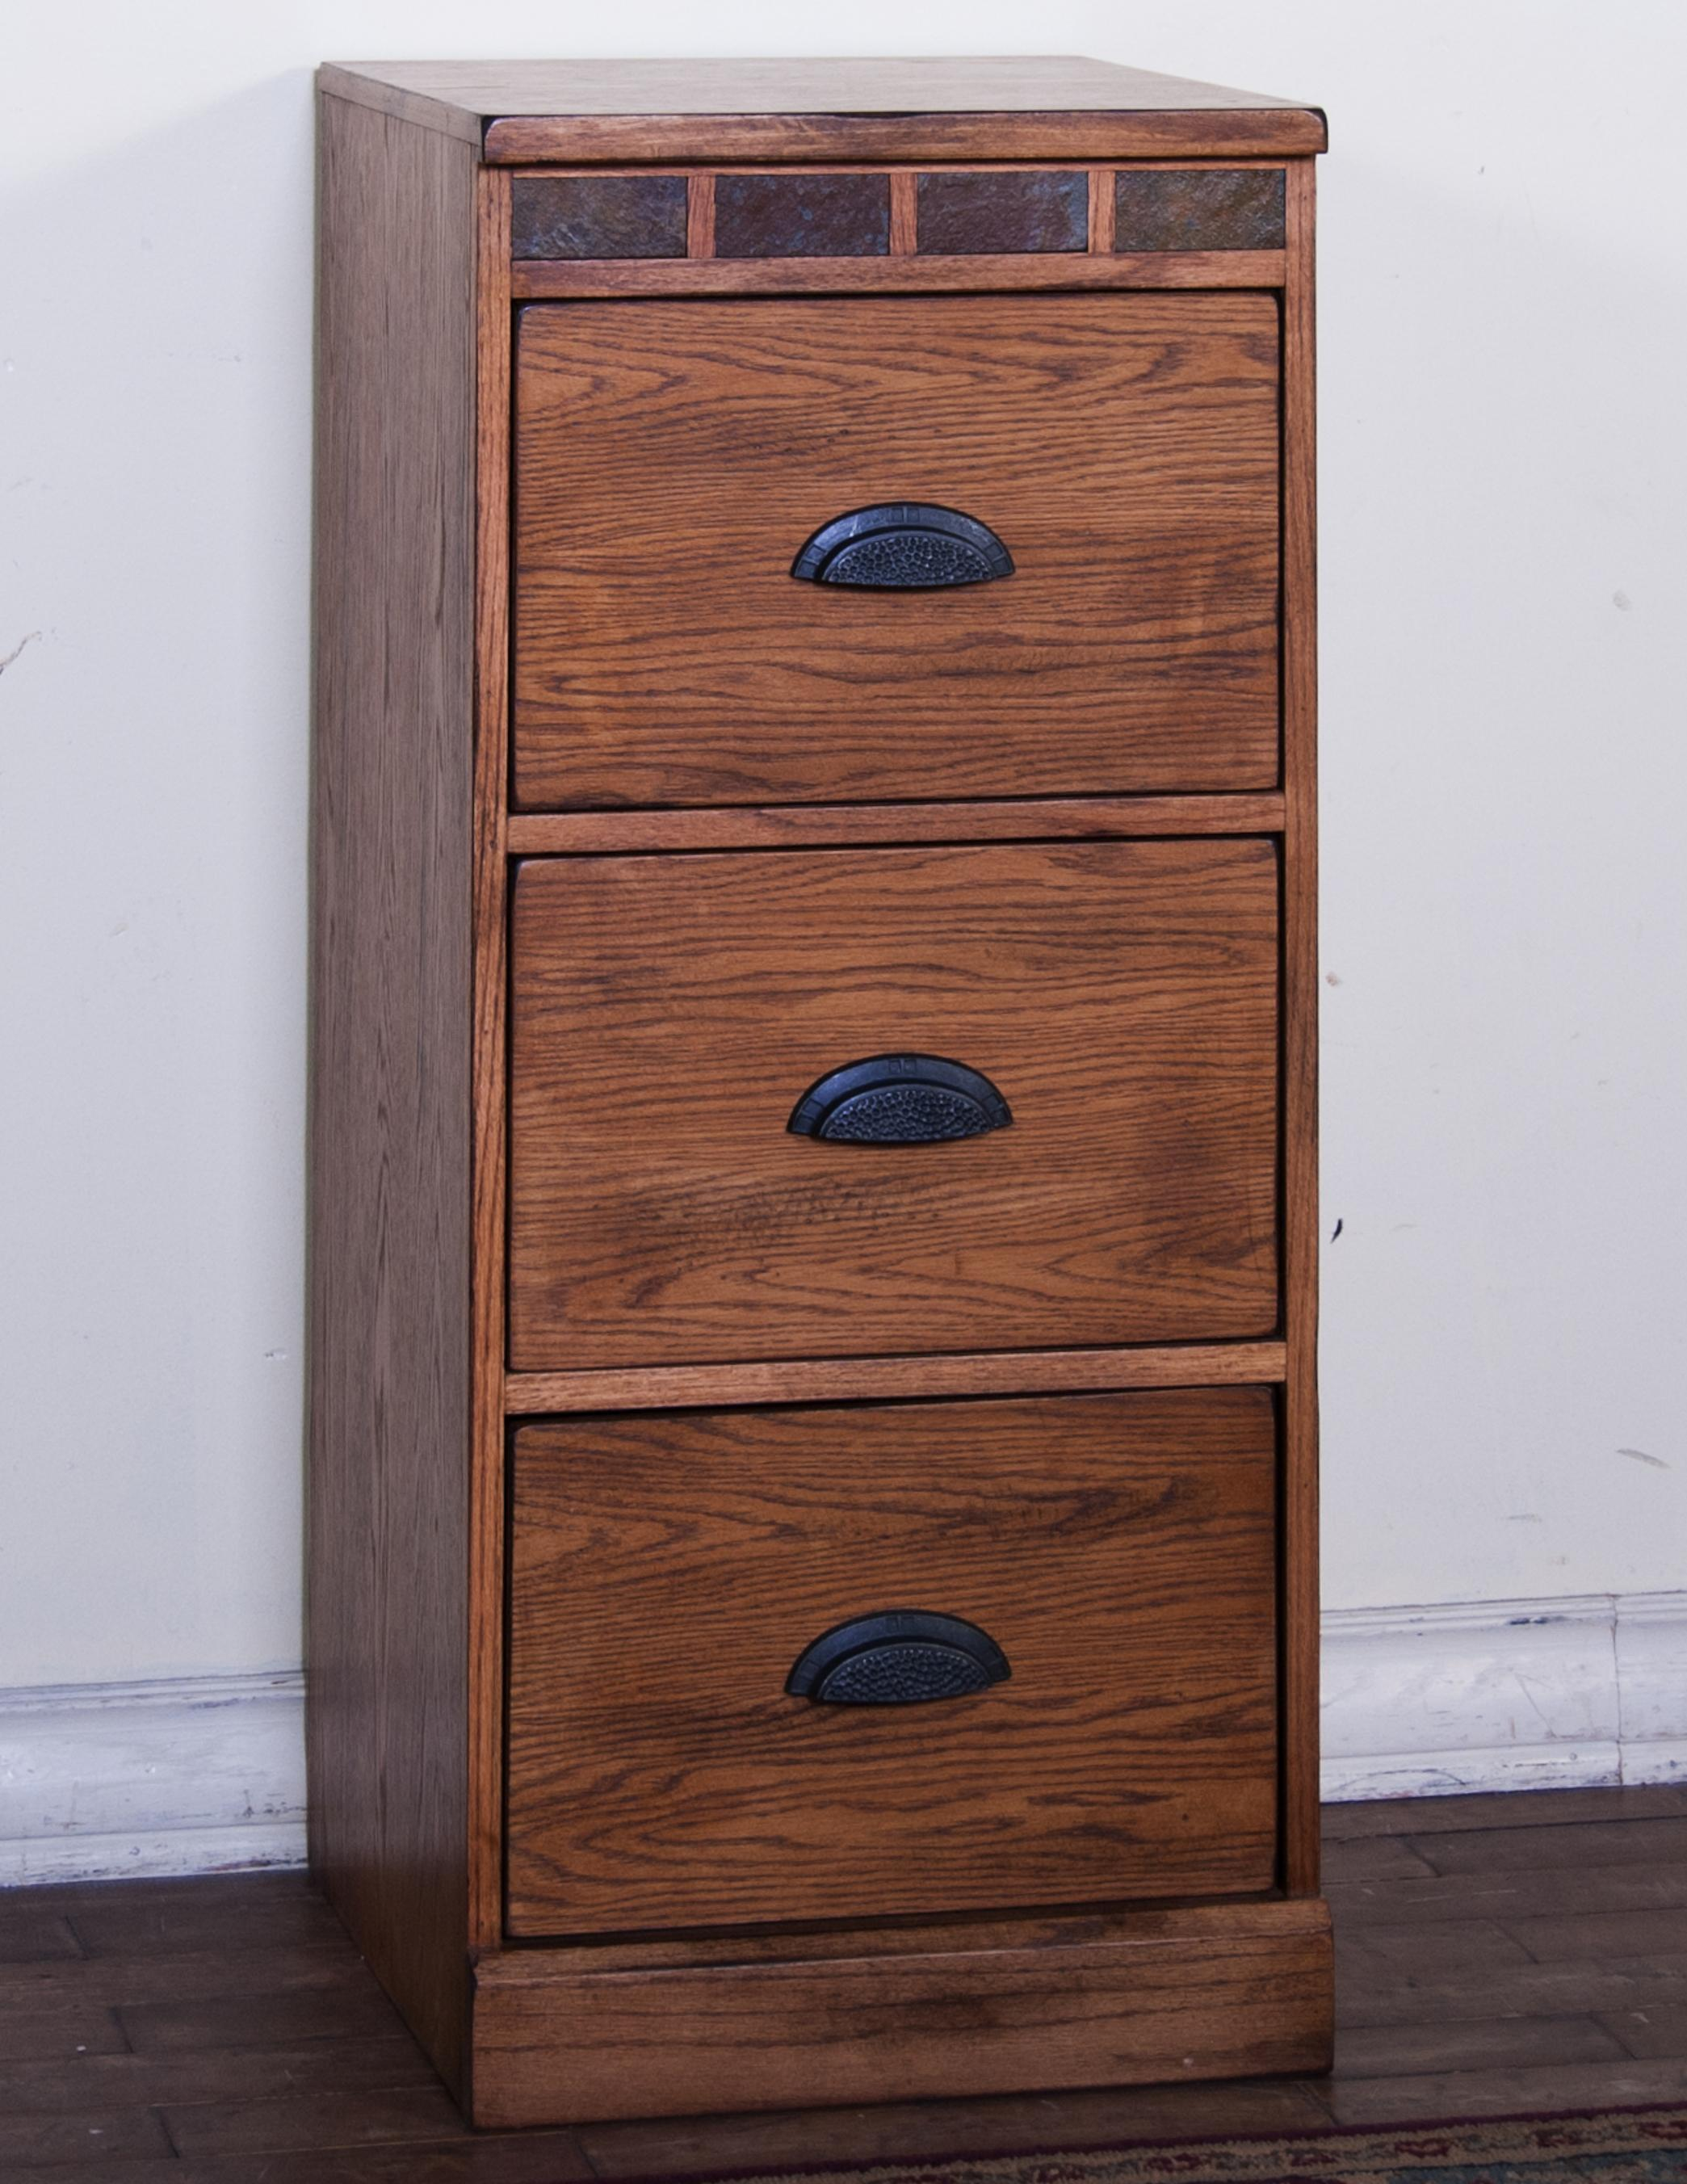 sunny designs sedona file cabinet item number 2863rof3